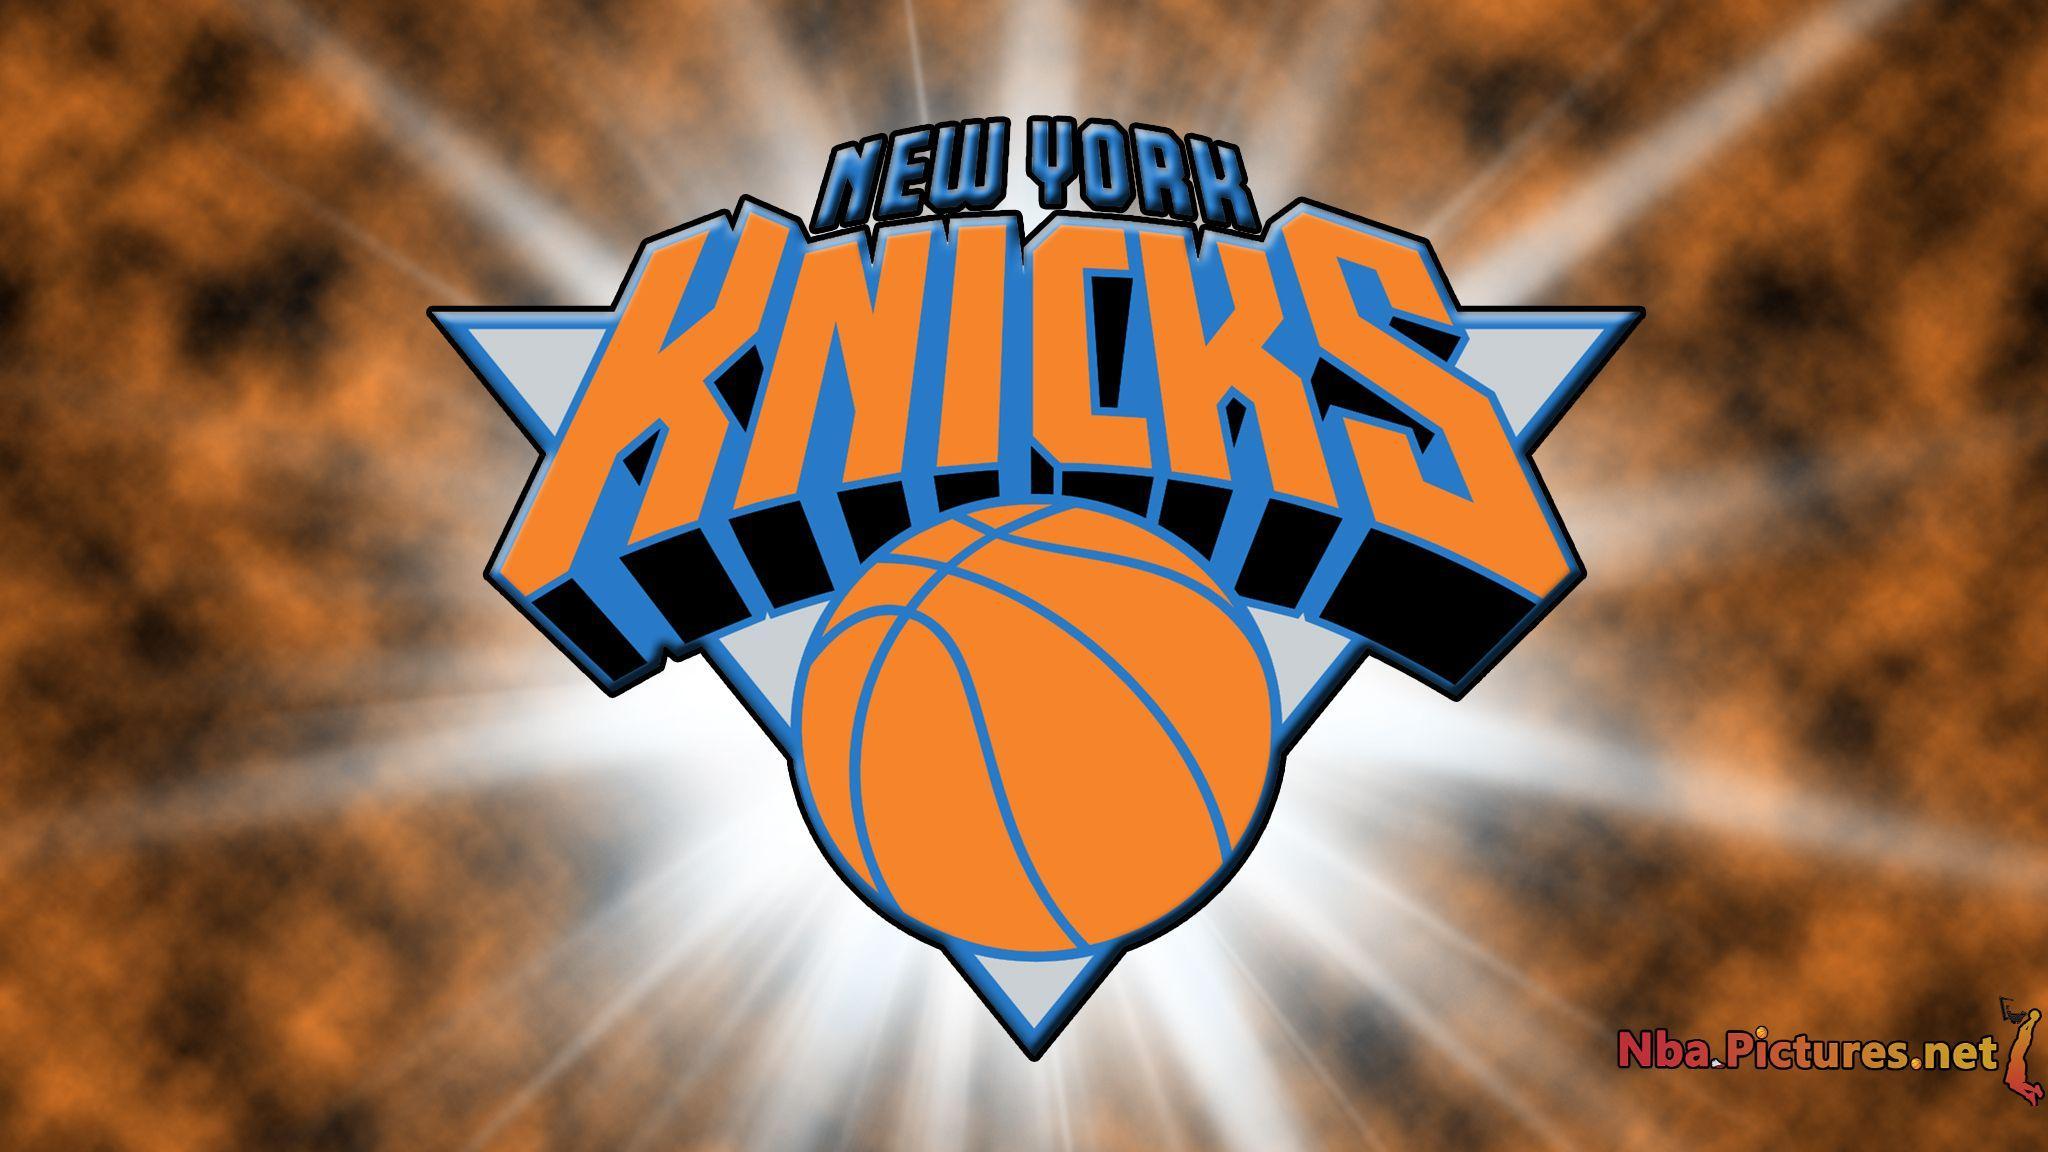 New York Knicks Wallpapers - Top Free New York Knicks ...